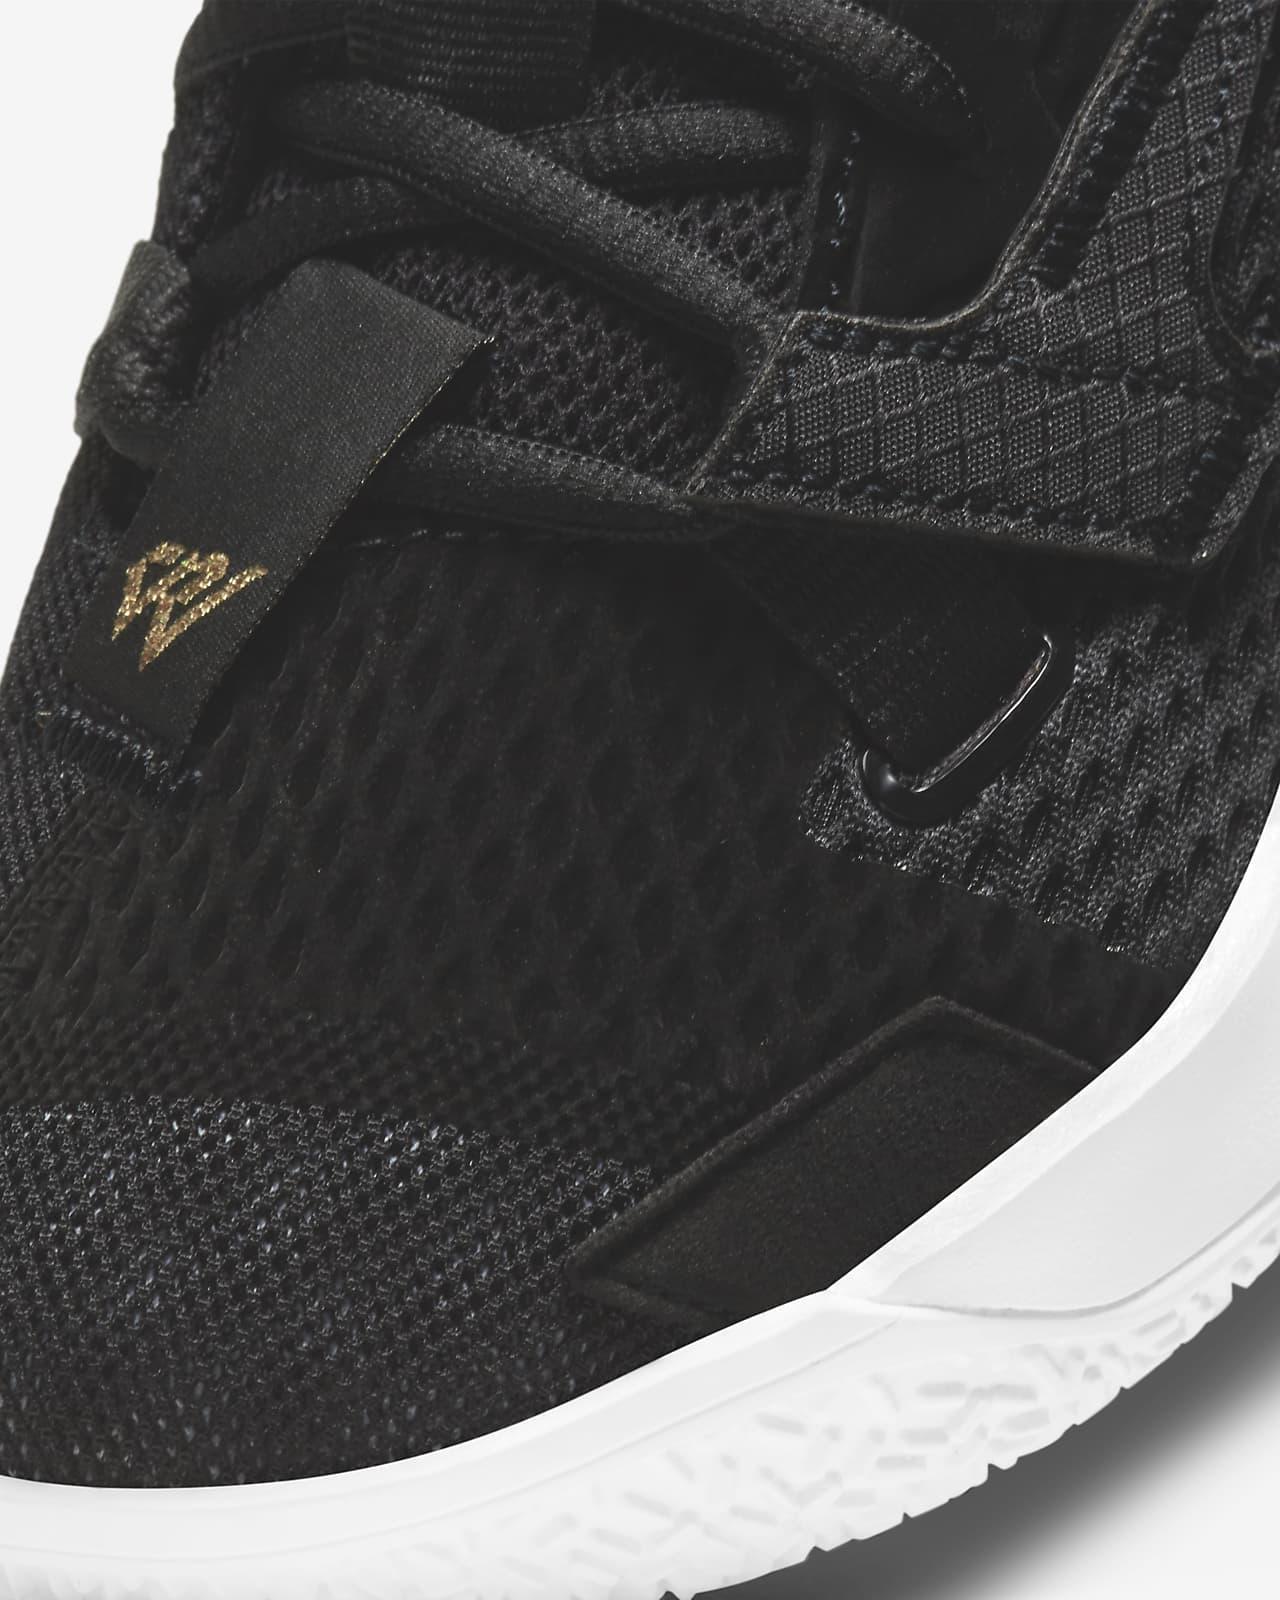 Jordan 'Why Not?' Zer0.4 Big Kids' Basketball Shoe